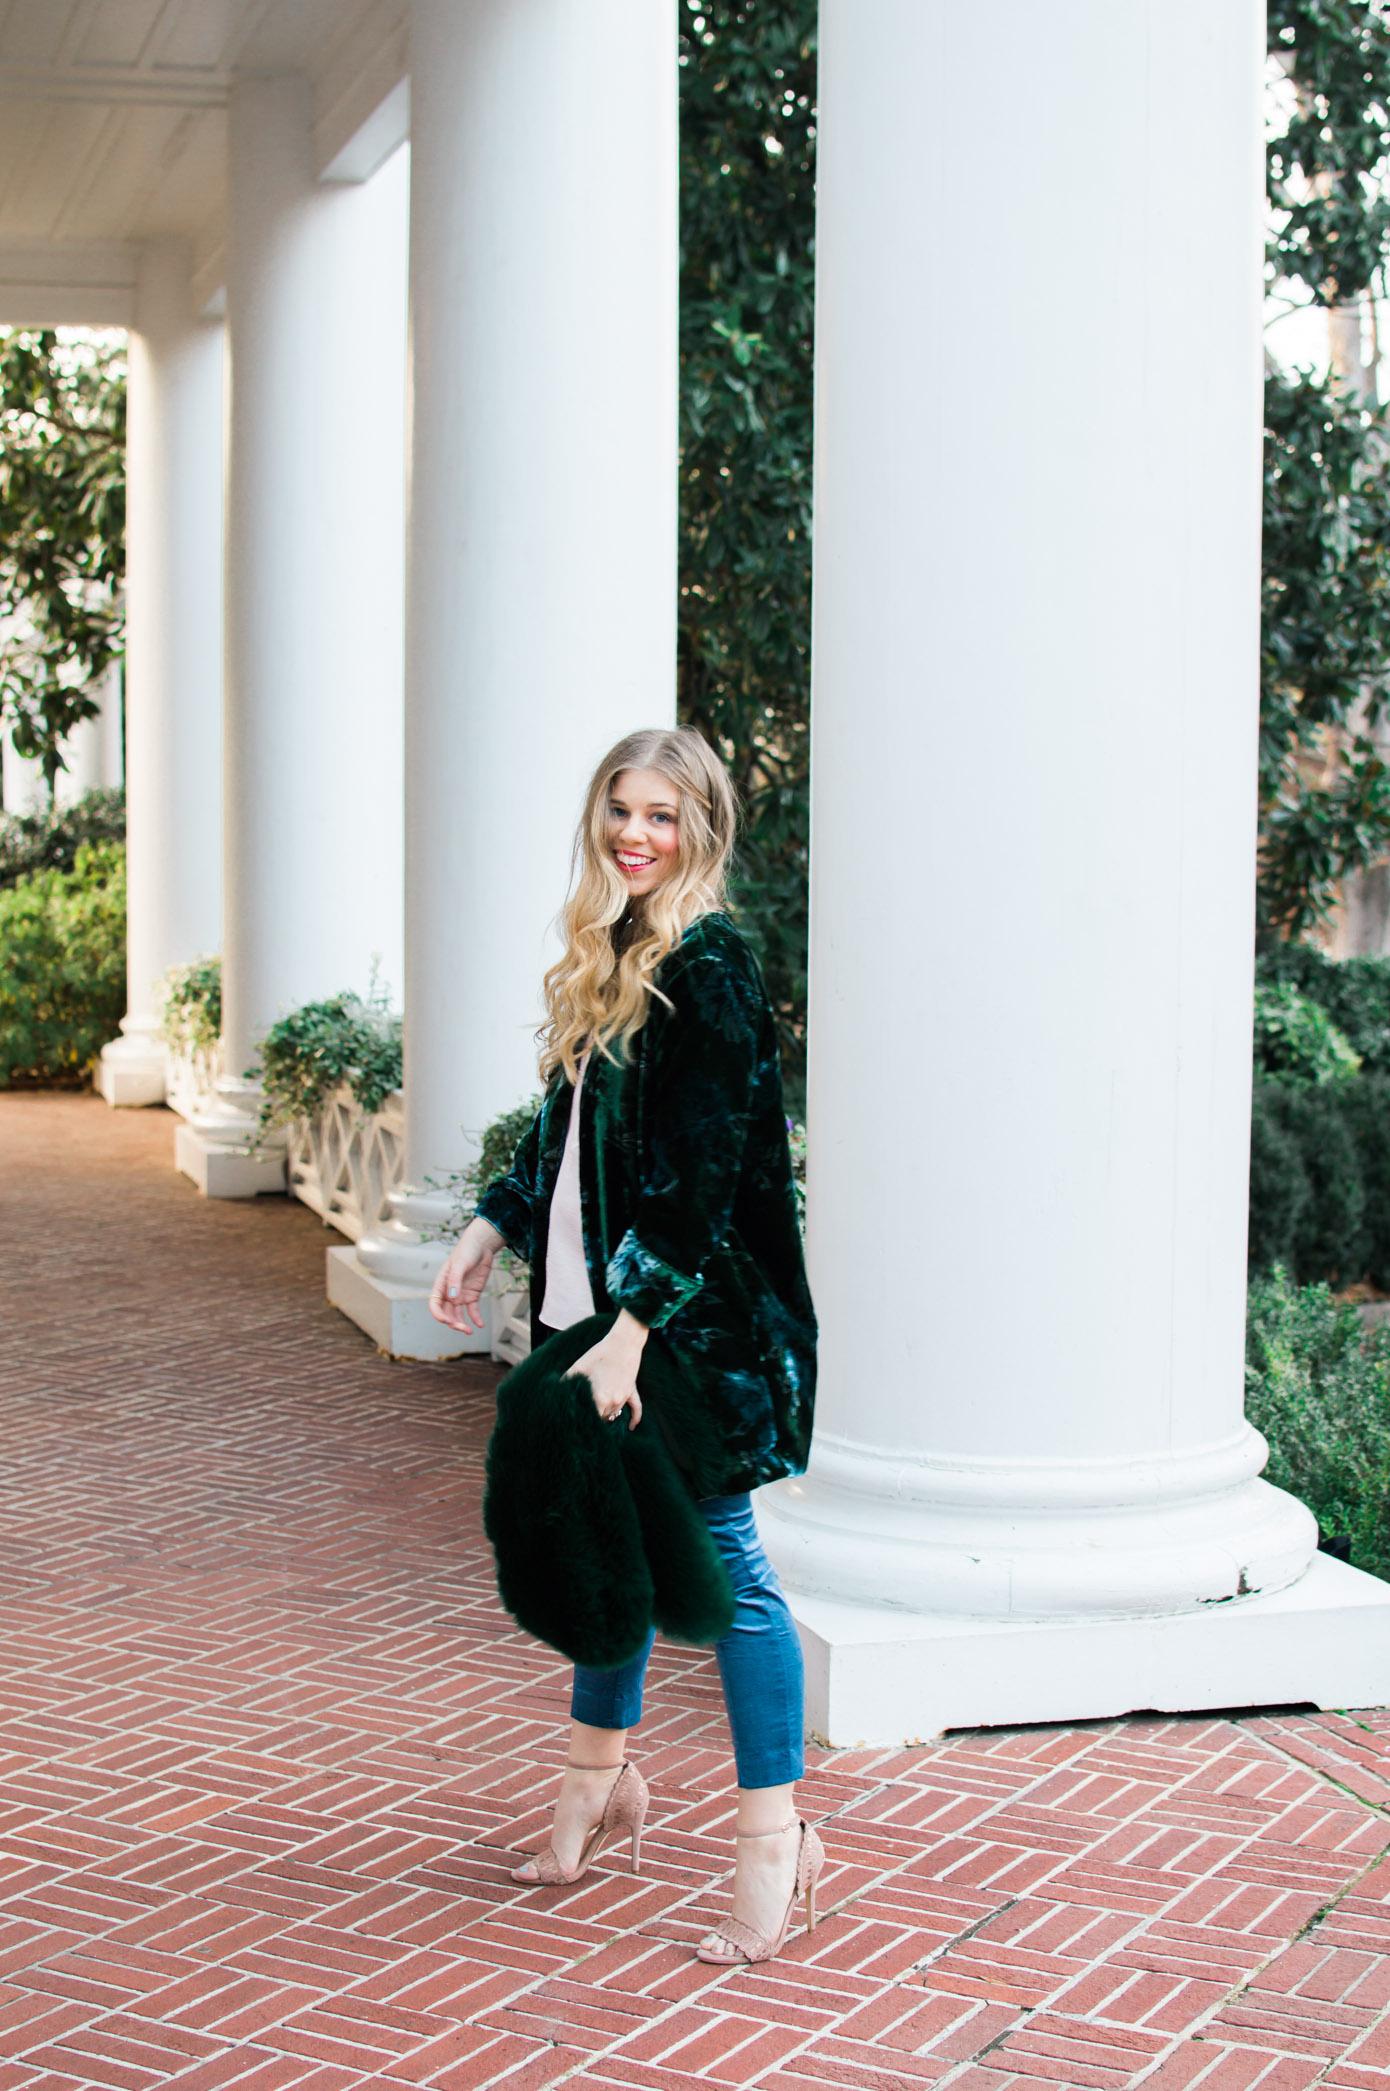 Winter Trends | Faux Fur Stole | Velvet Blazer | Louella Reese Life & Style Blog